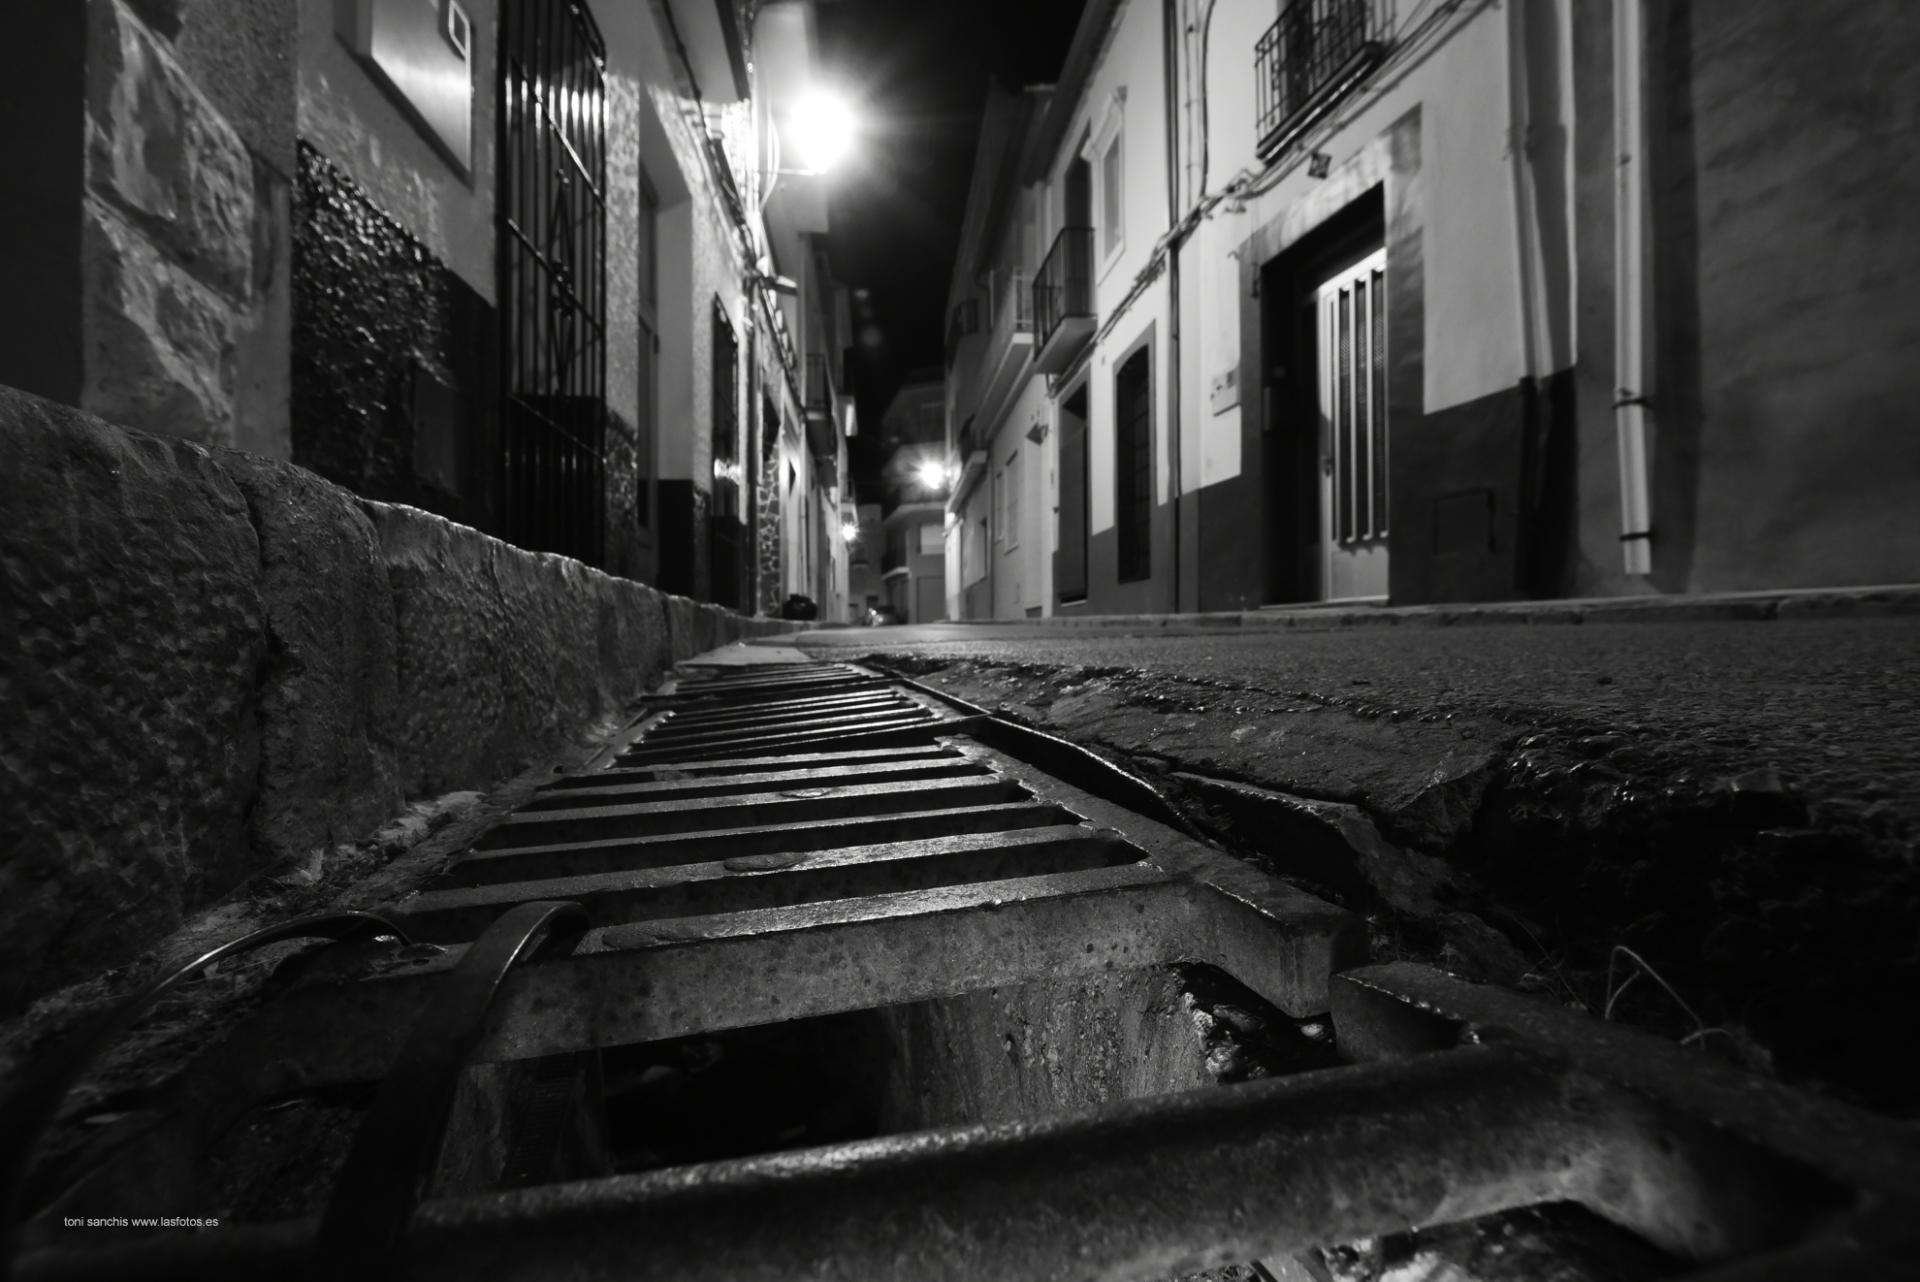 toni-sanchis-nocturna-casco-antiguo